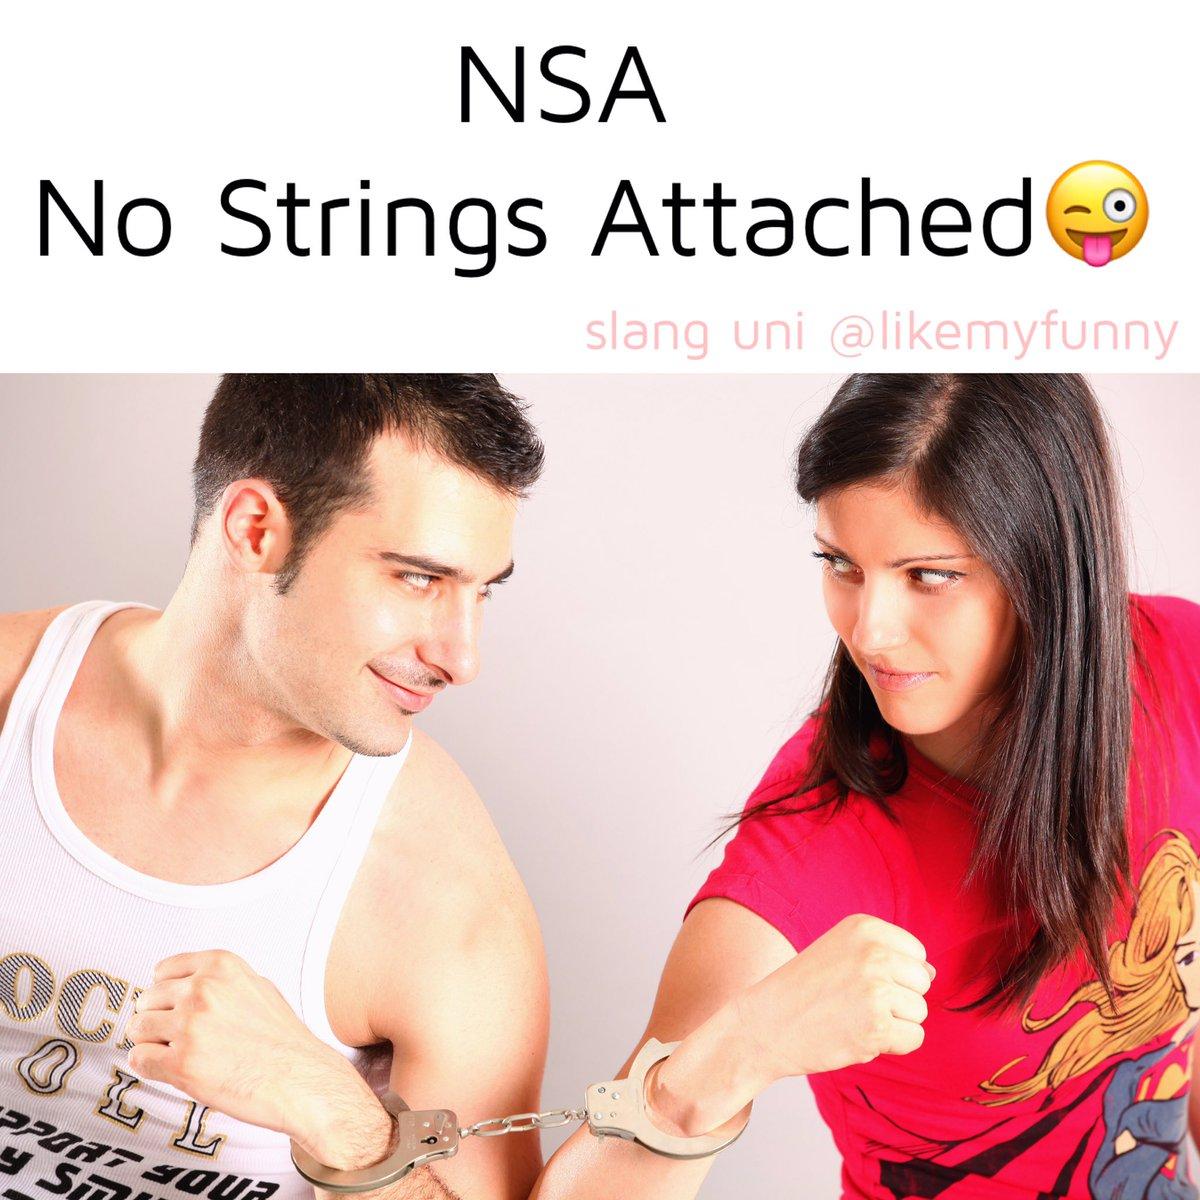 nsa dating slang